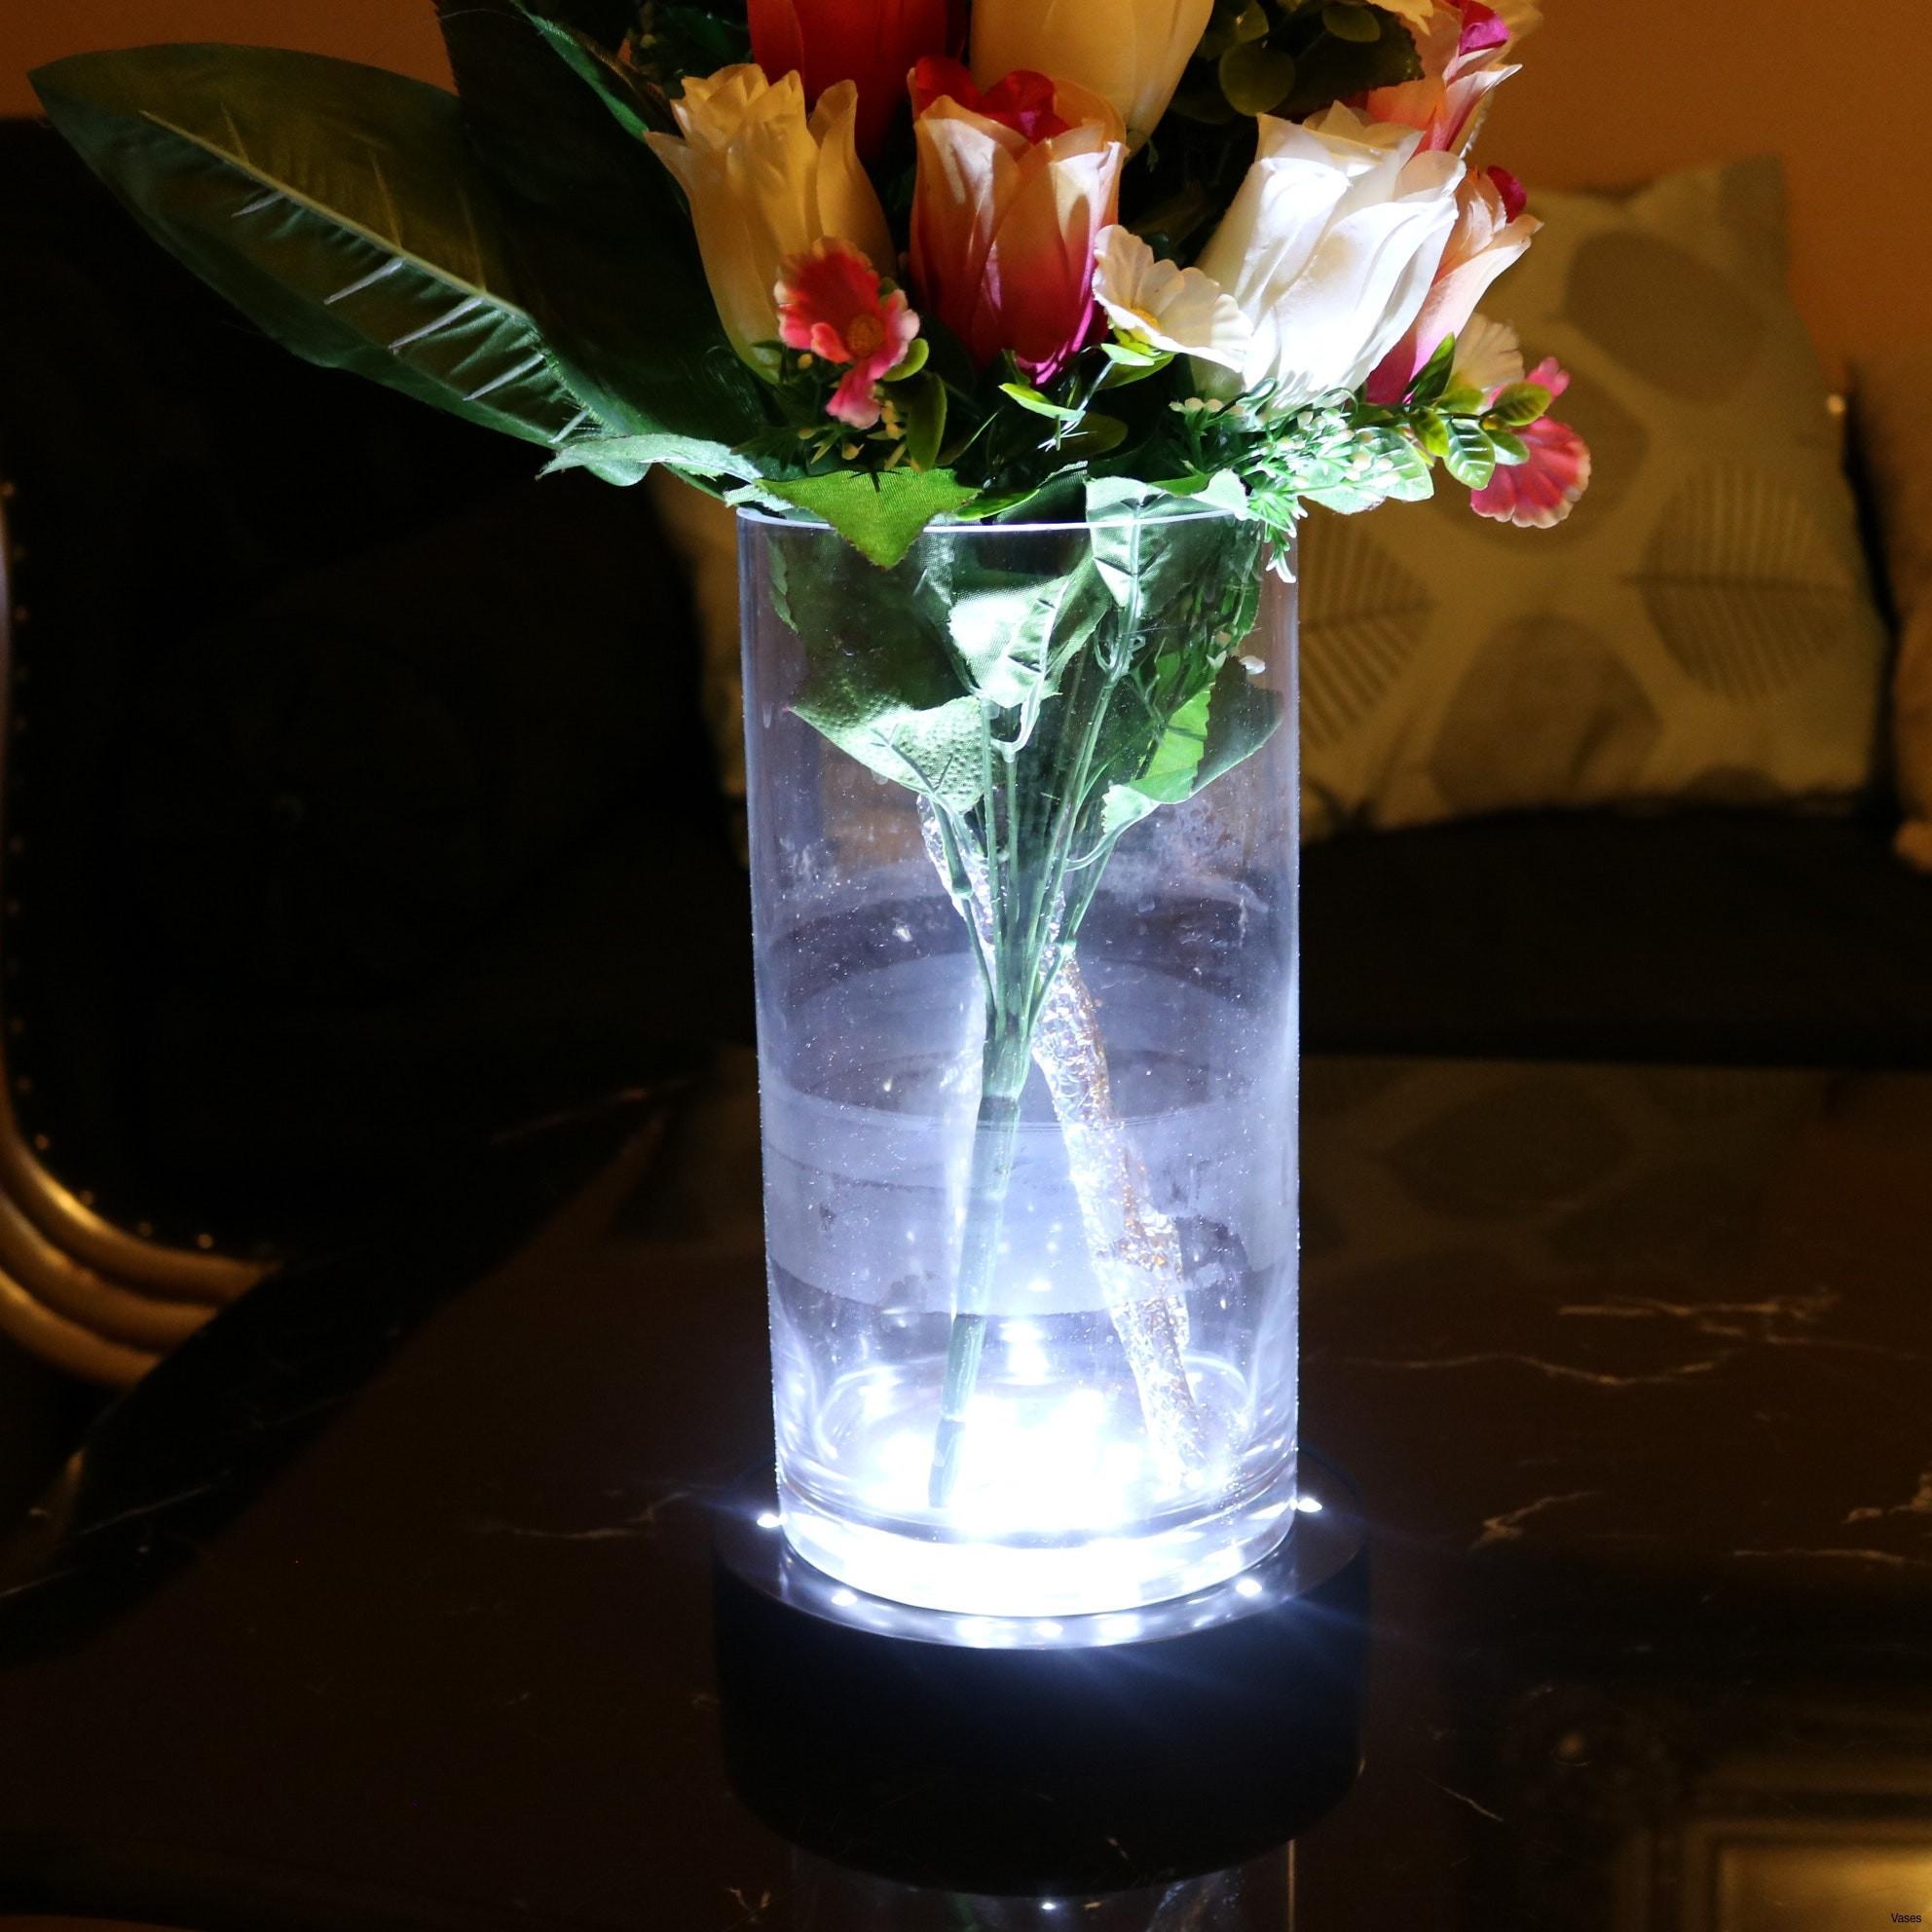 14 Amazing Vase Gift Box 2021 free download vase gift box of flower box ideas luxury inspiration lane just femininity pinterest for vases decorative flower ac2b7 flower box ideas elegant 27 fresh plastic floral liners